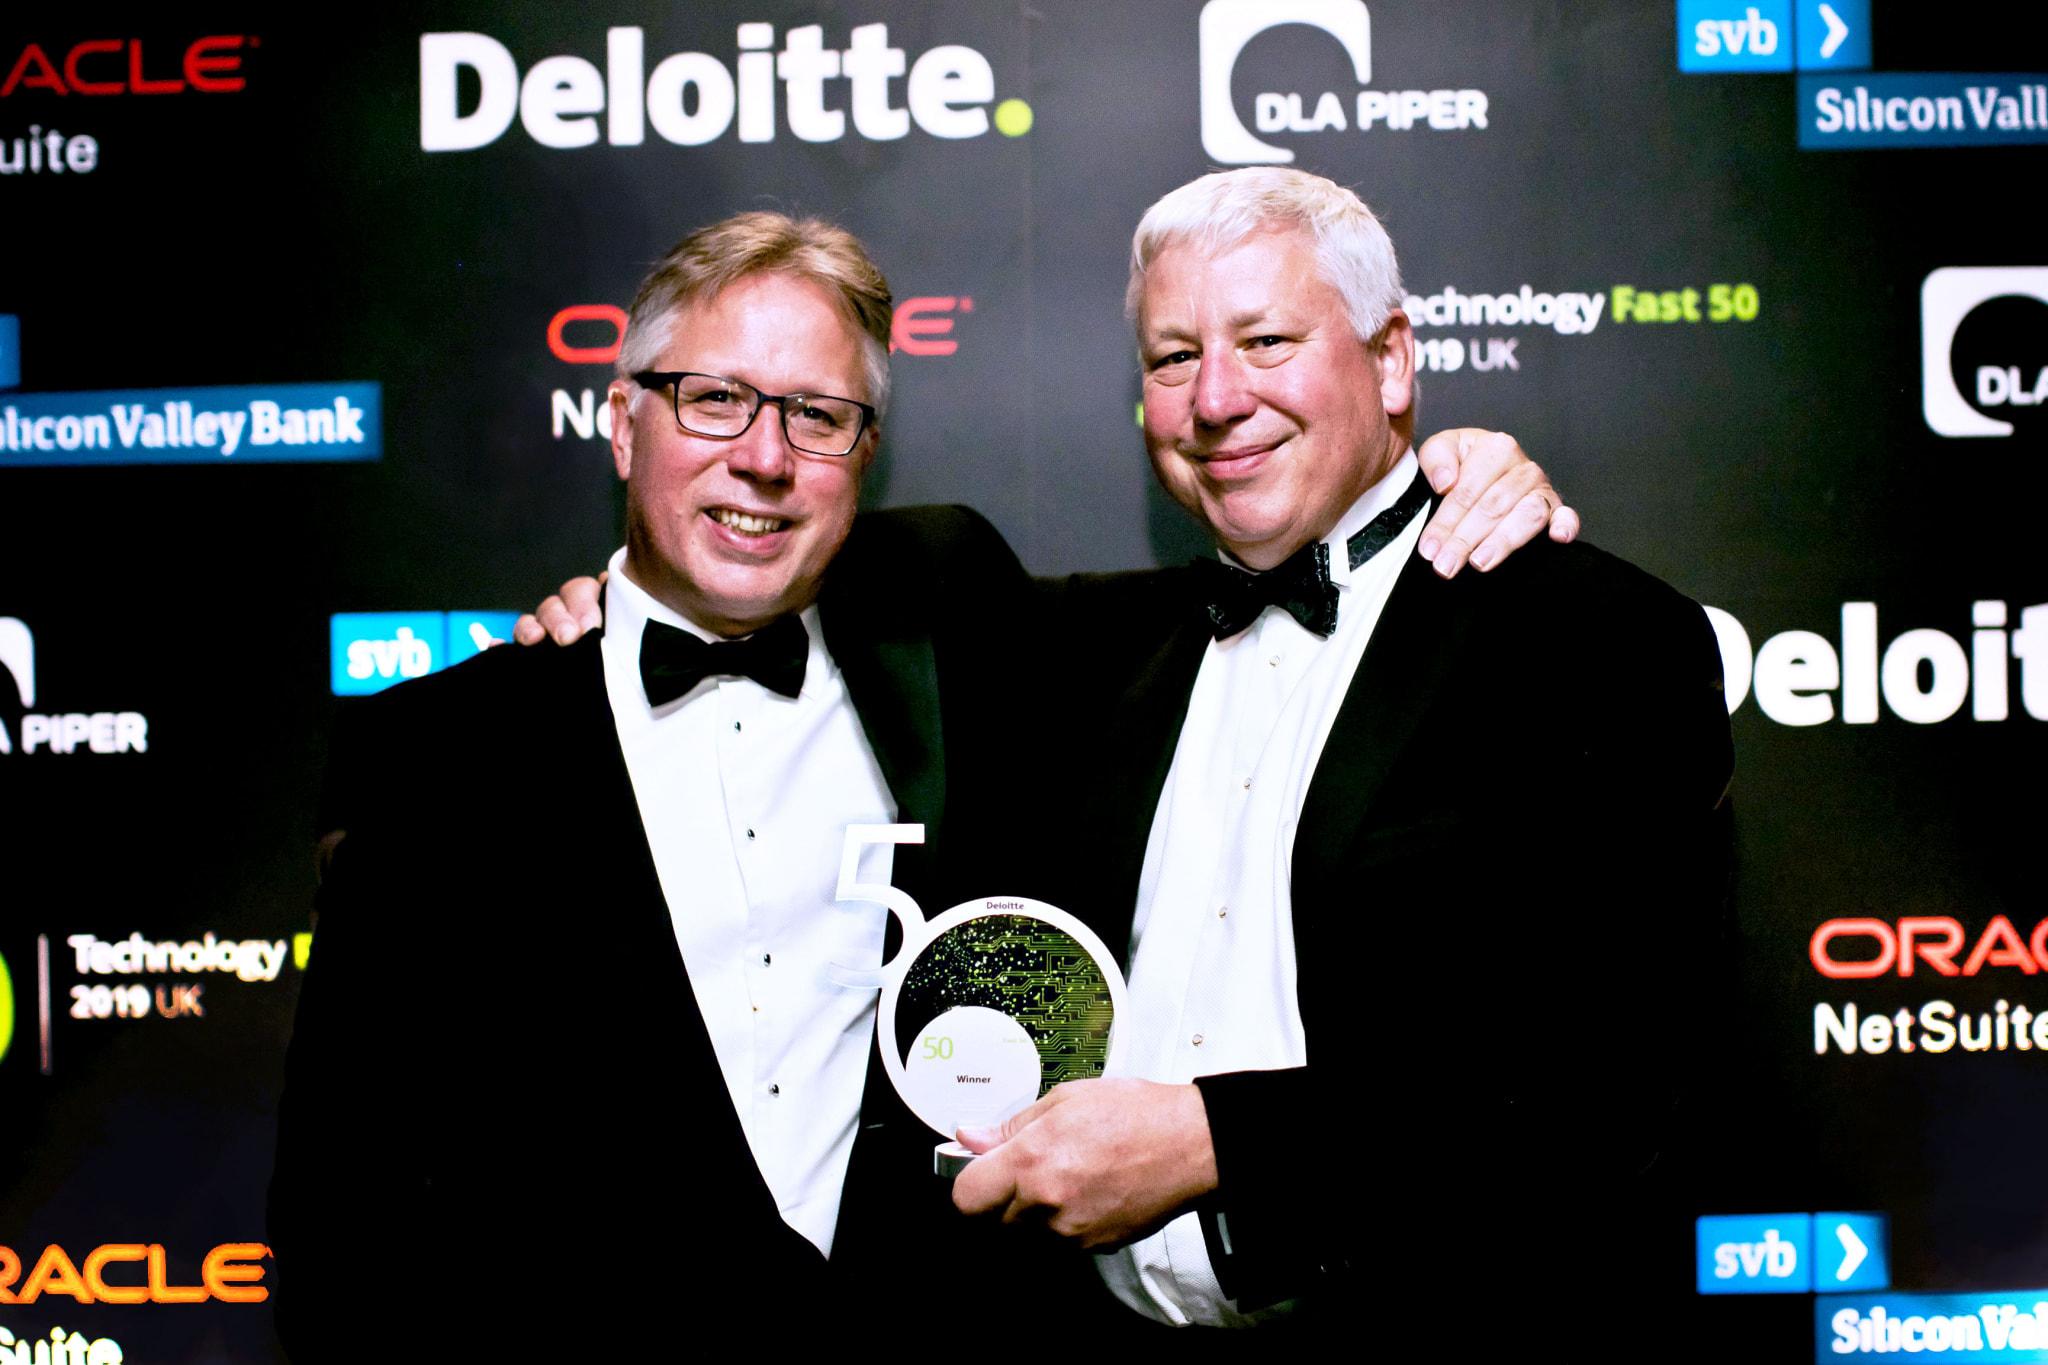 Simon Papworth_Jonathan_Papworth – Deloitte award